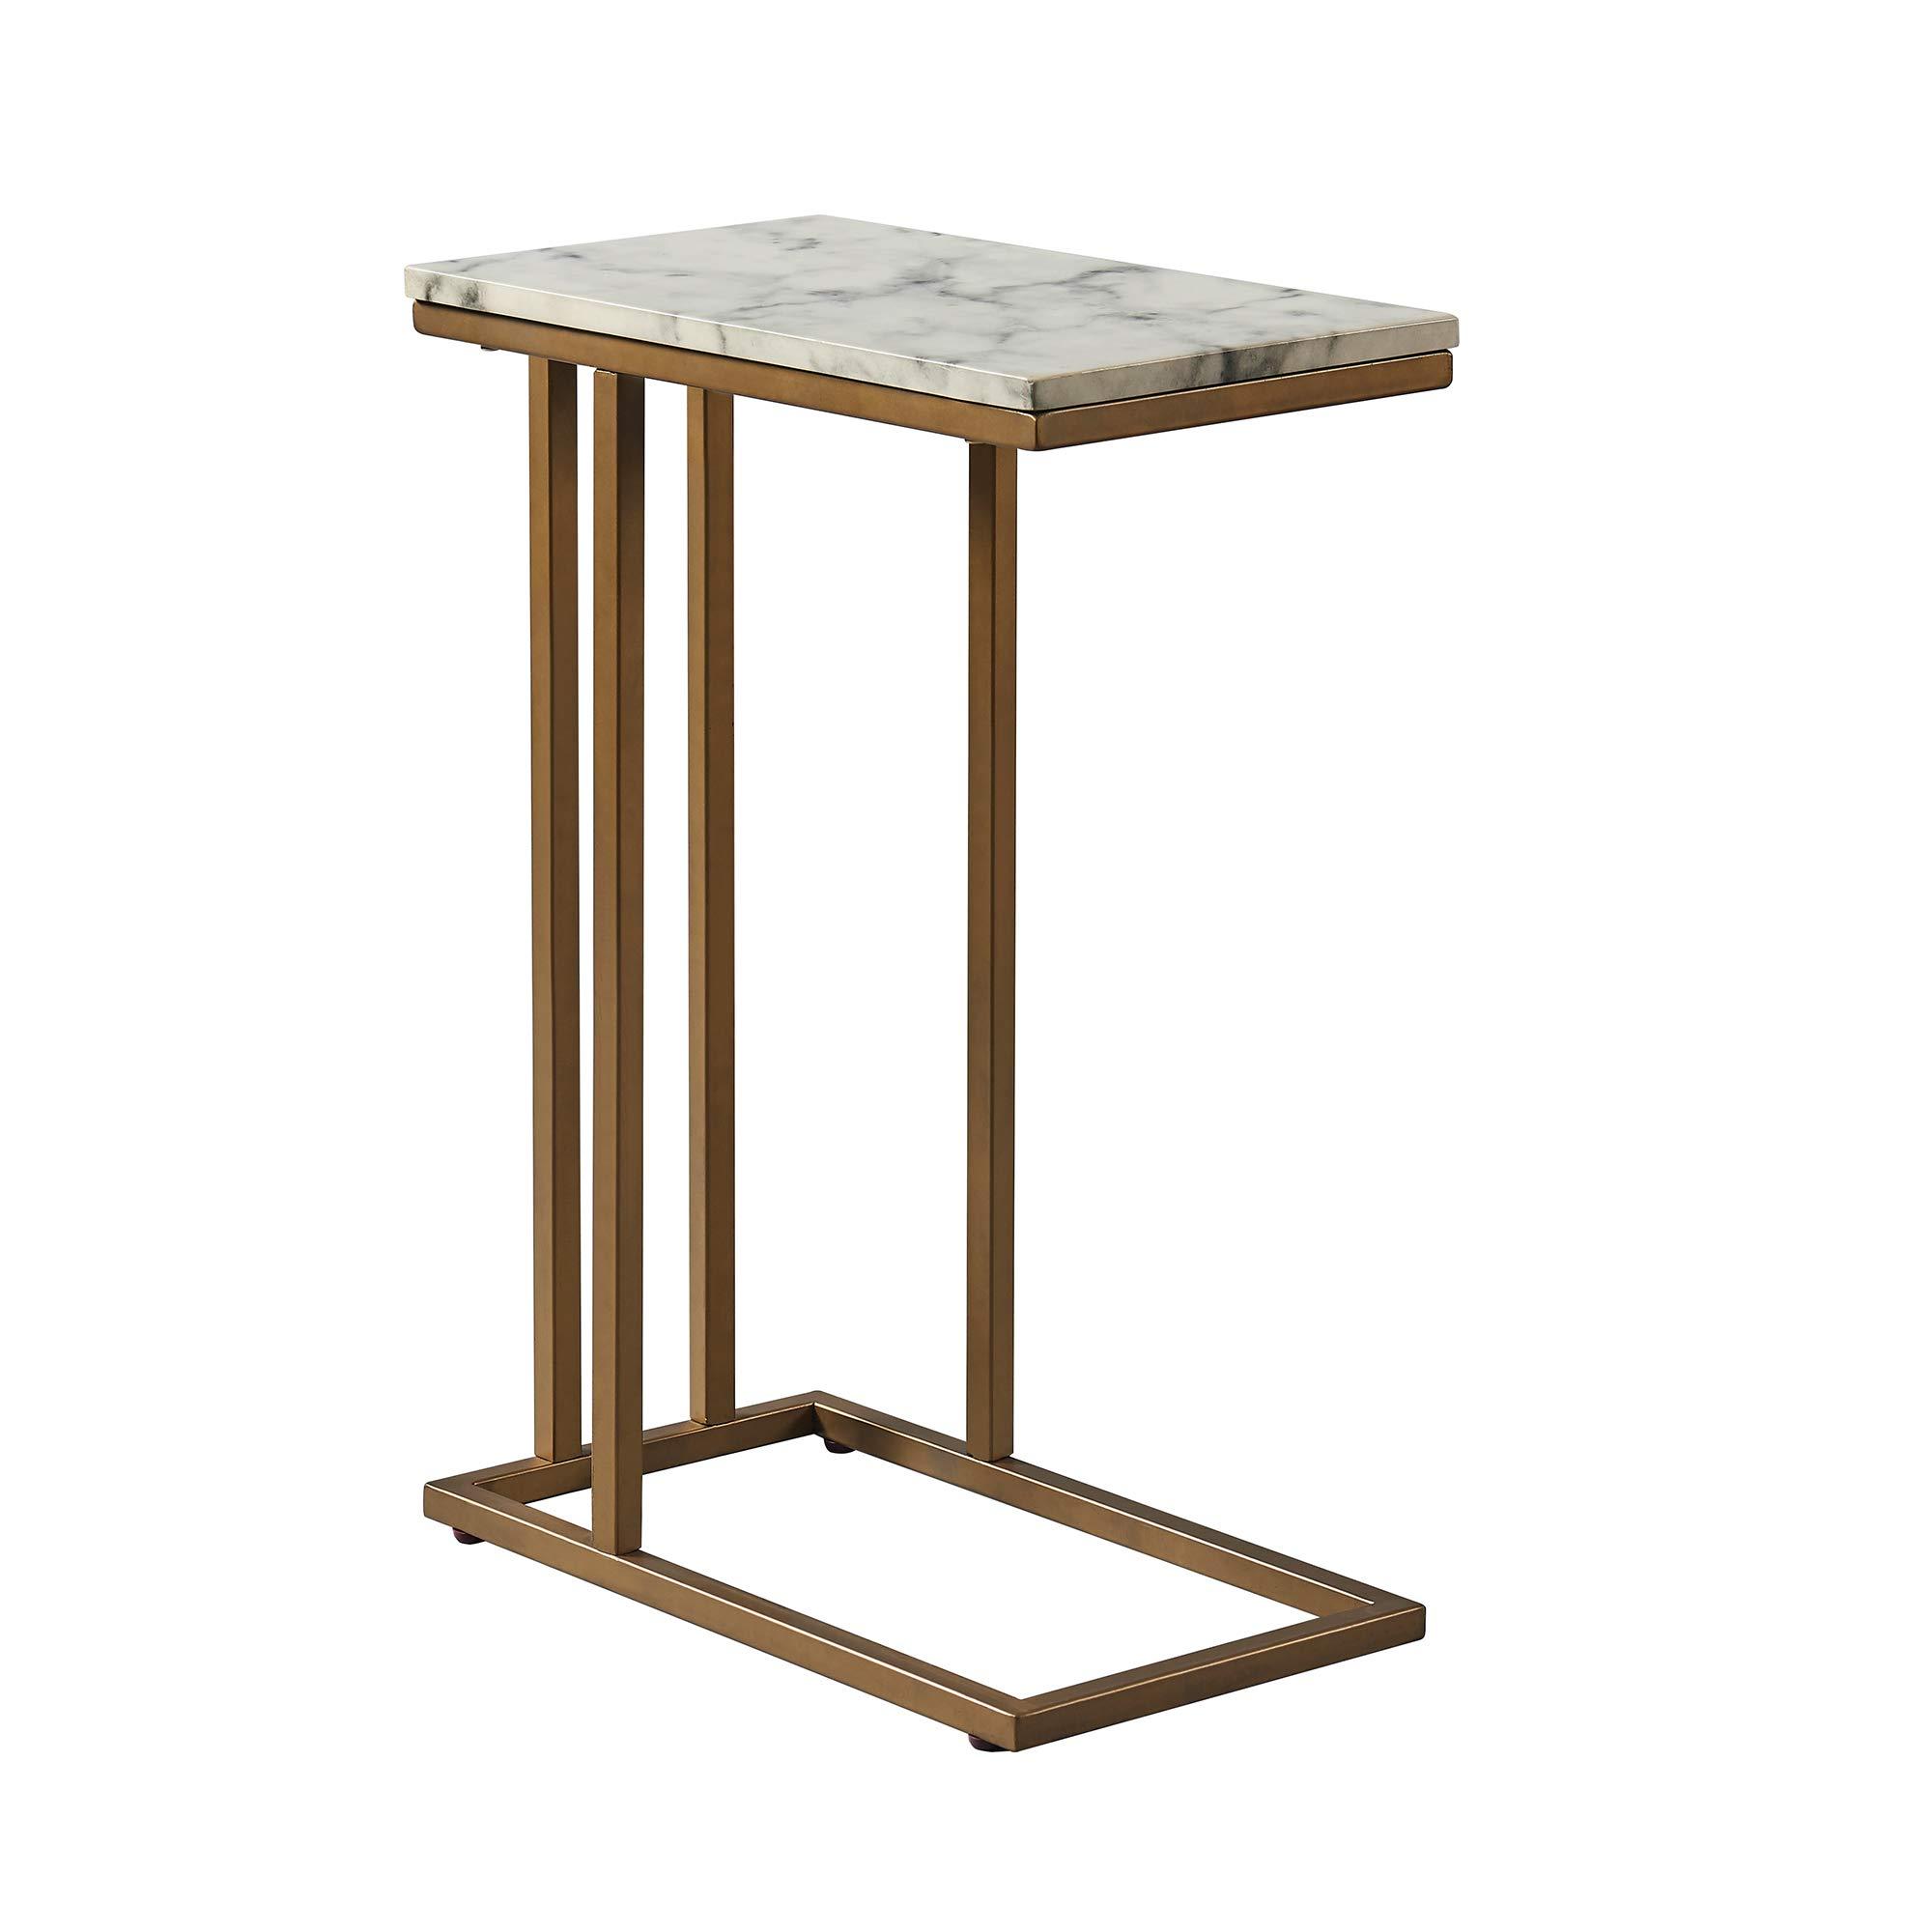 Versanora - Marmo C Shape Table - Faux Marble /Brass by Versanora (Image #7)